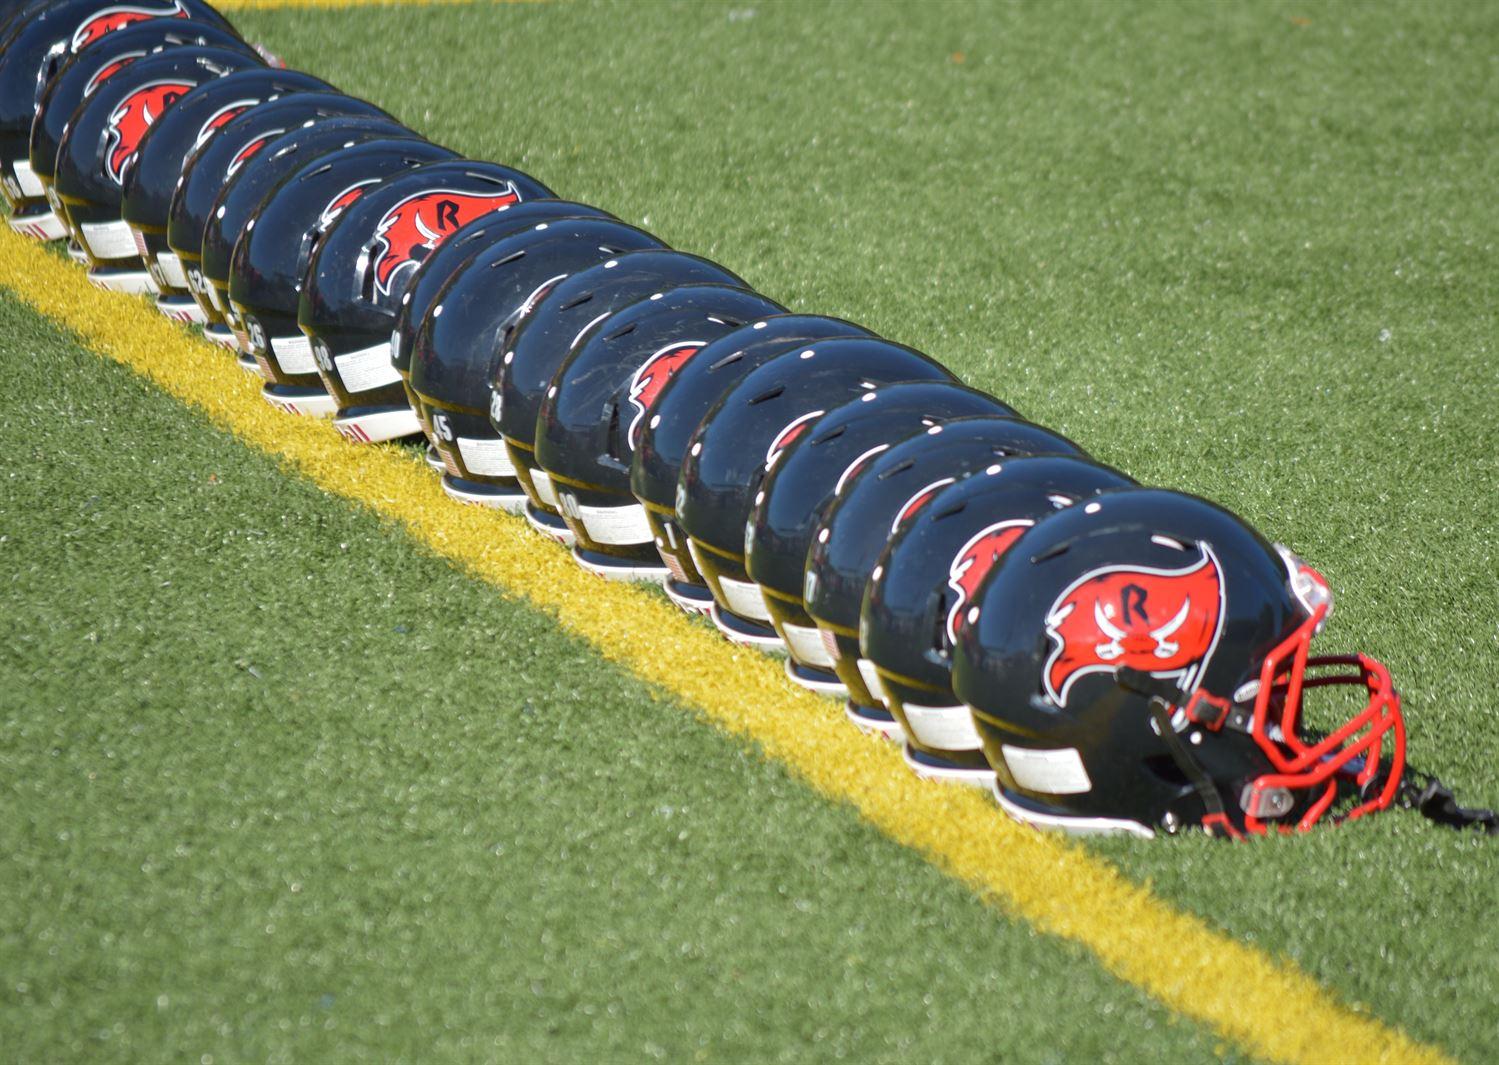 BANC Raiders - Seniors - Head Coach Rick Muskus